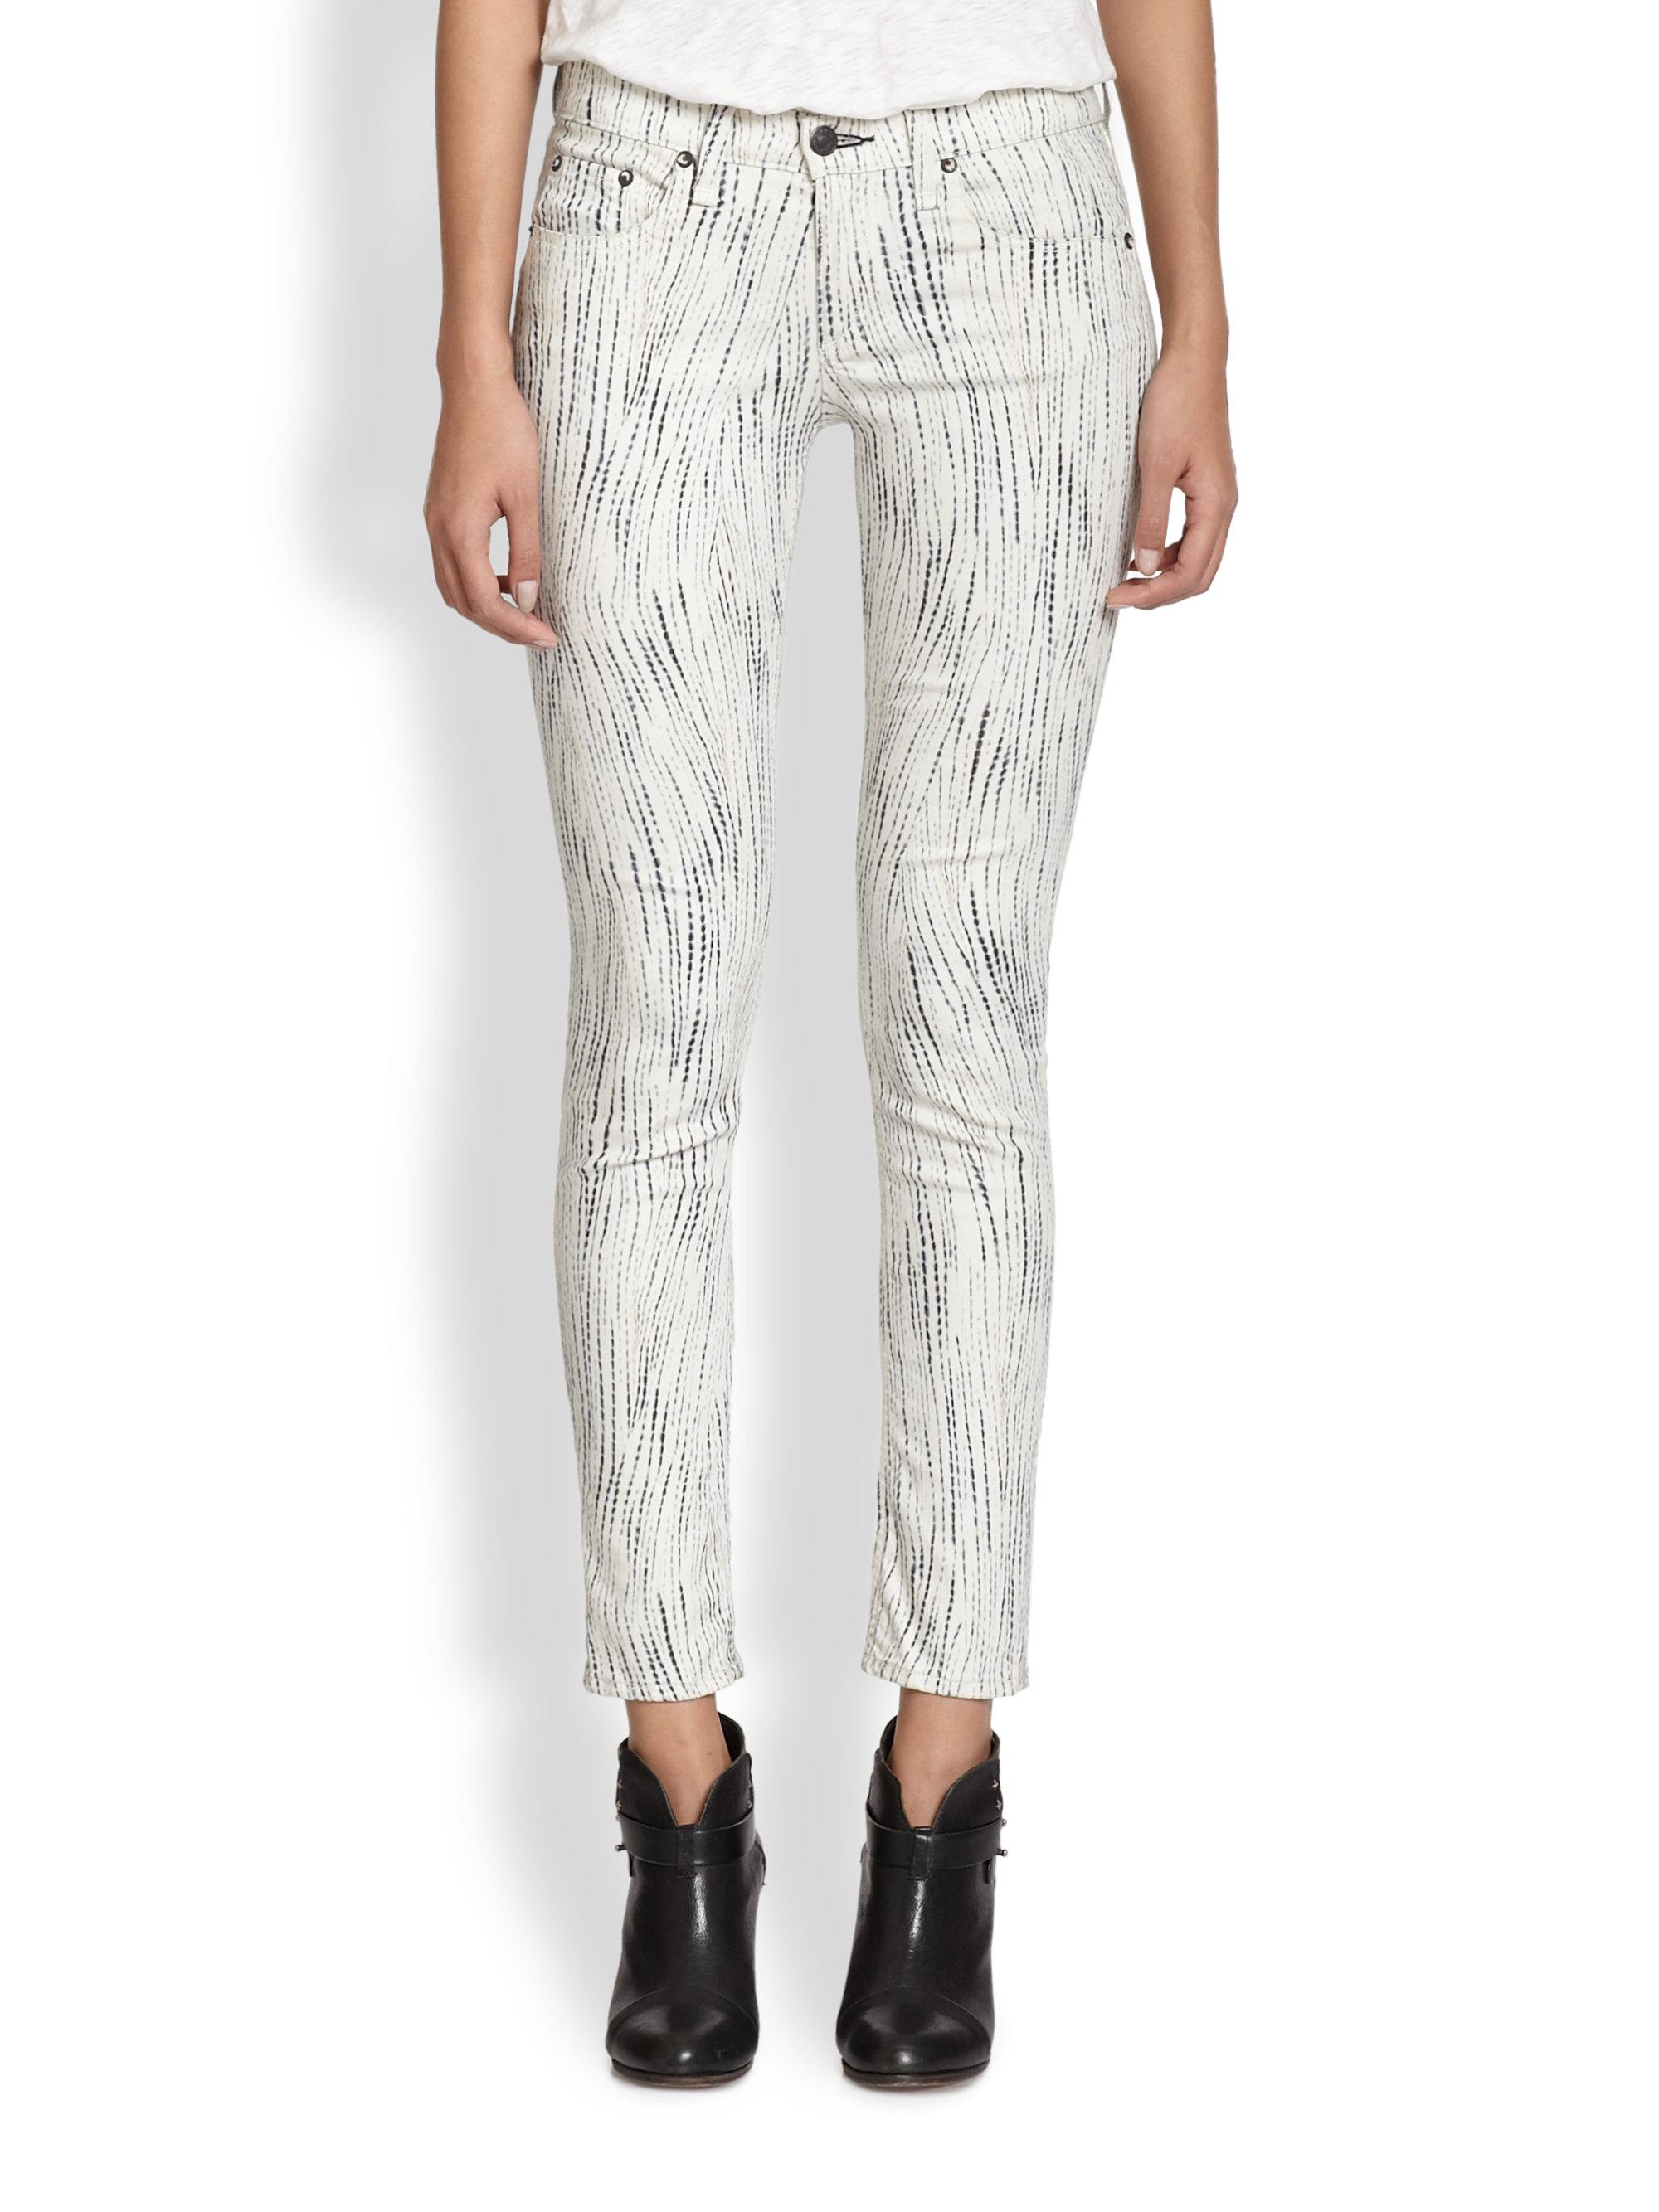 Rag & bone Printed Skinny Jeans in White | Lyst